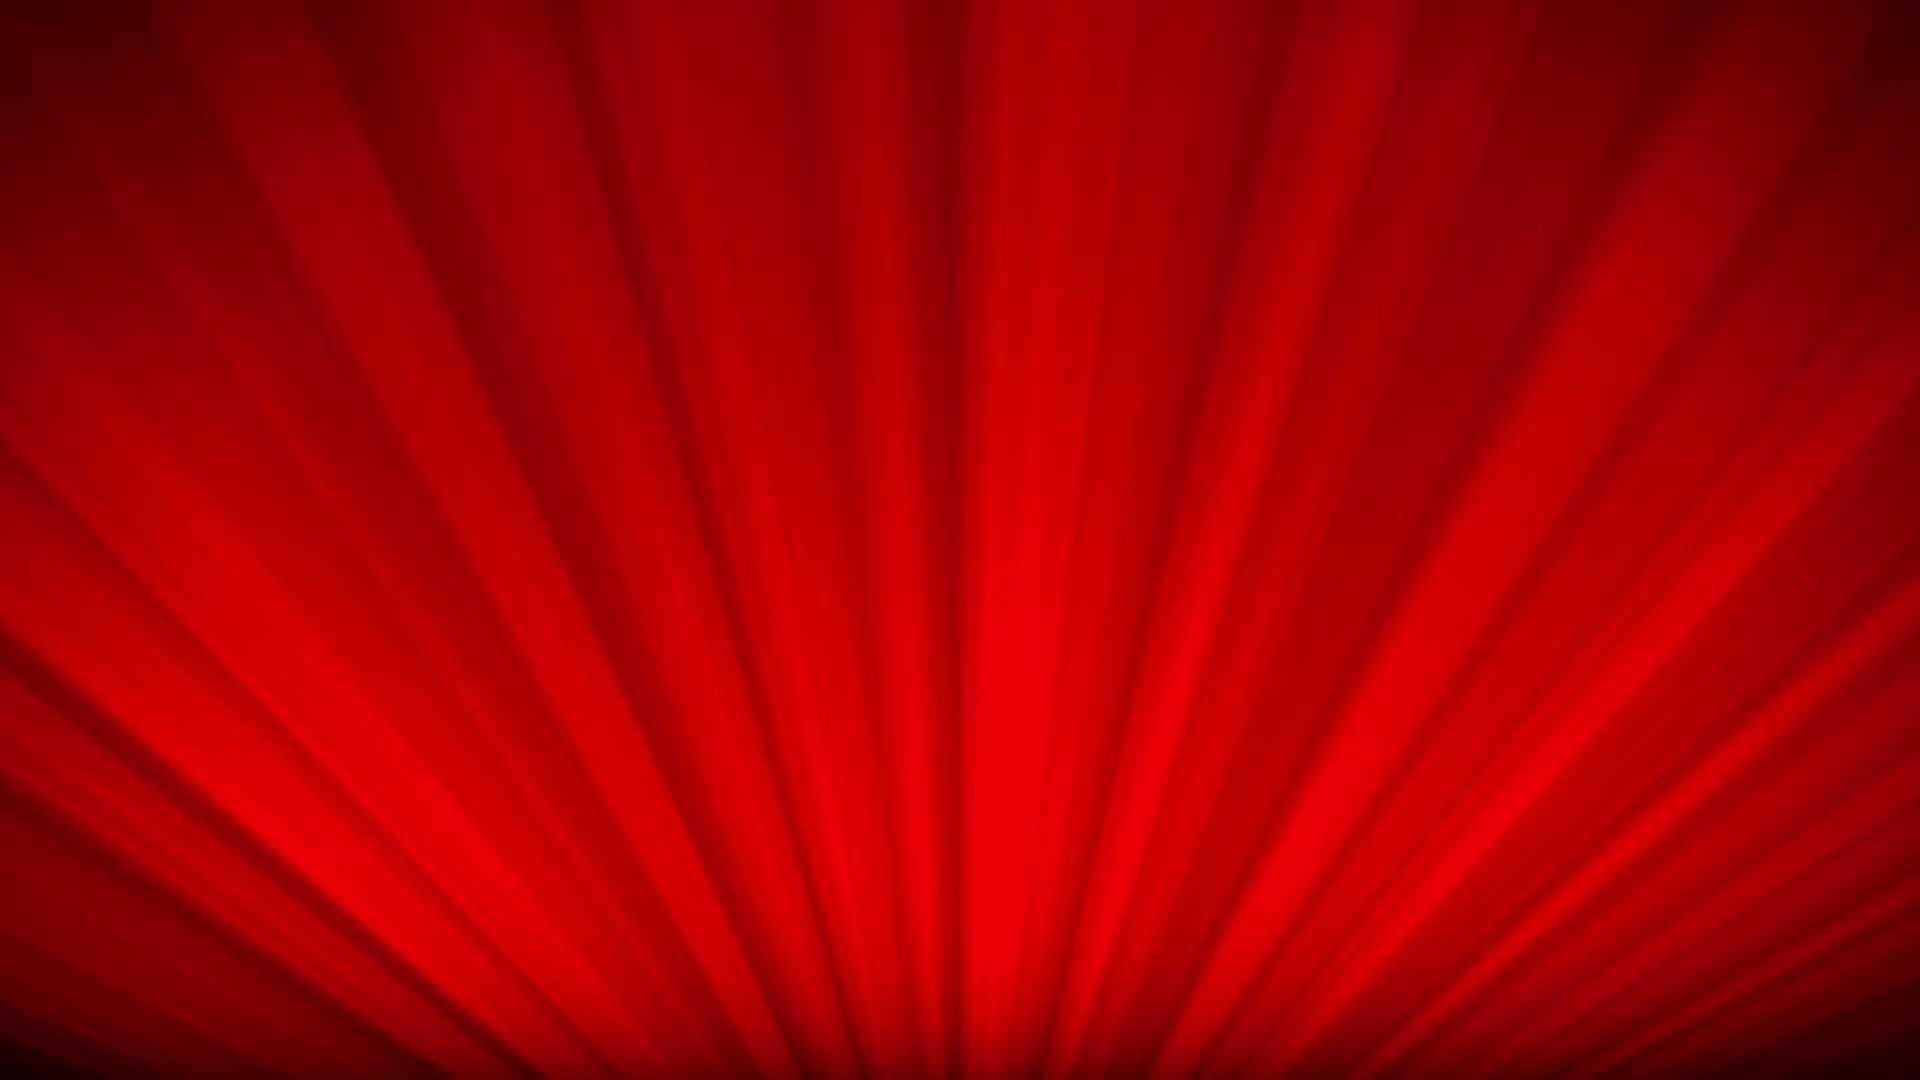 Red Background Images Wallpapersafari